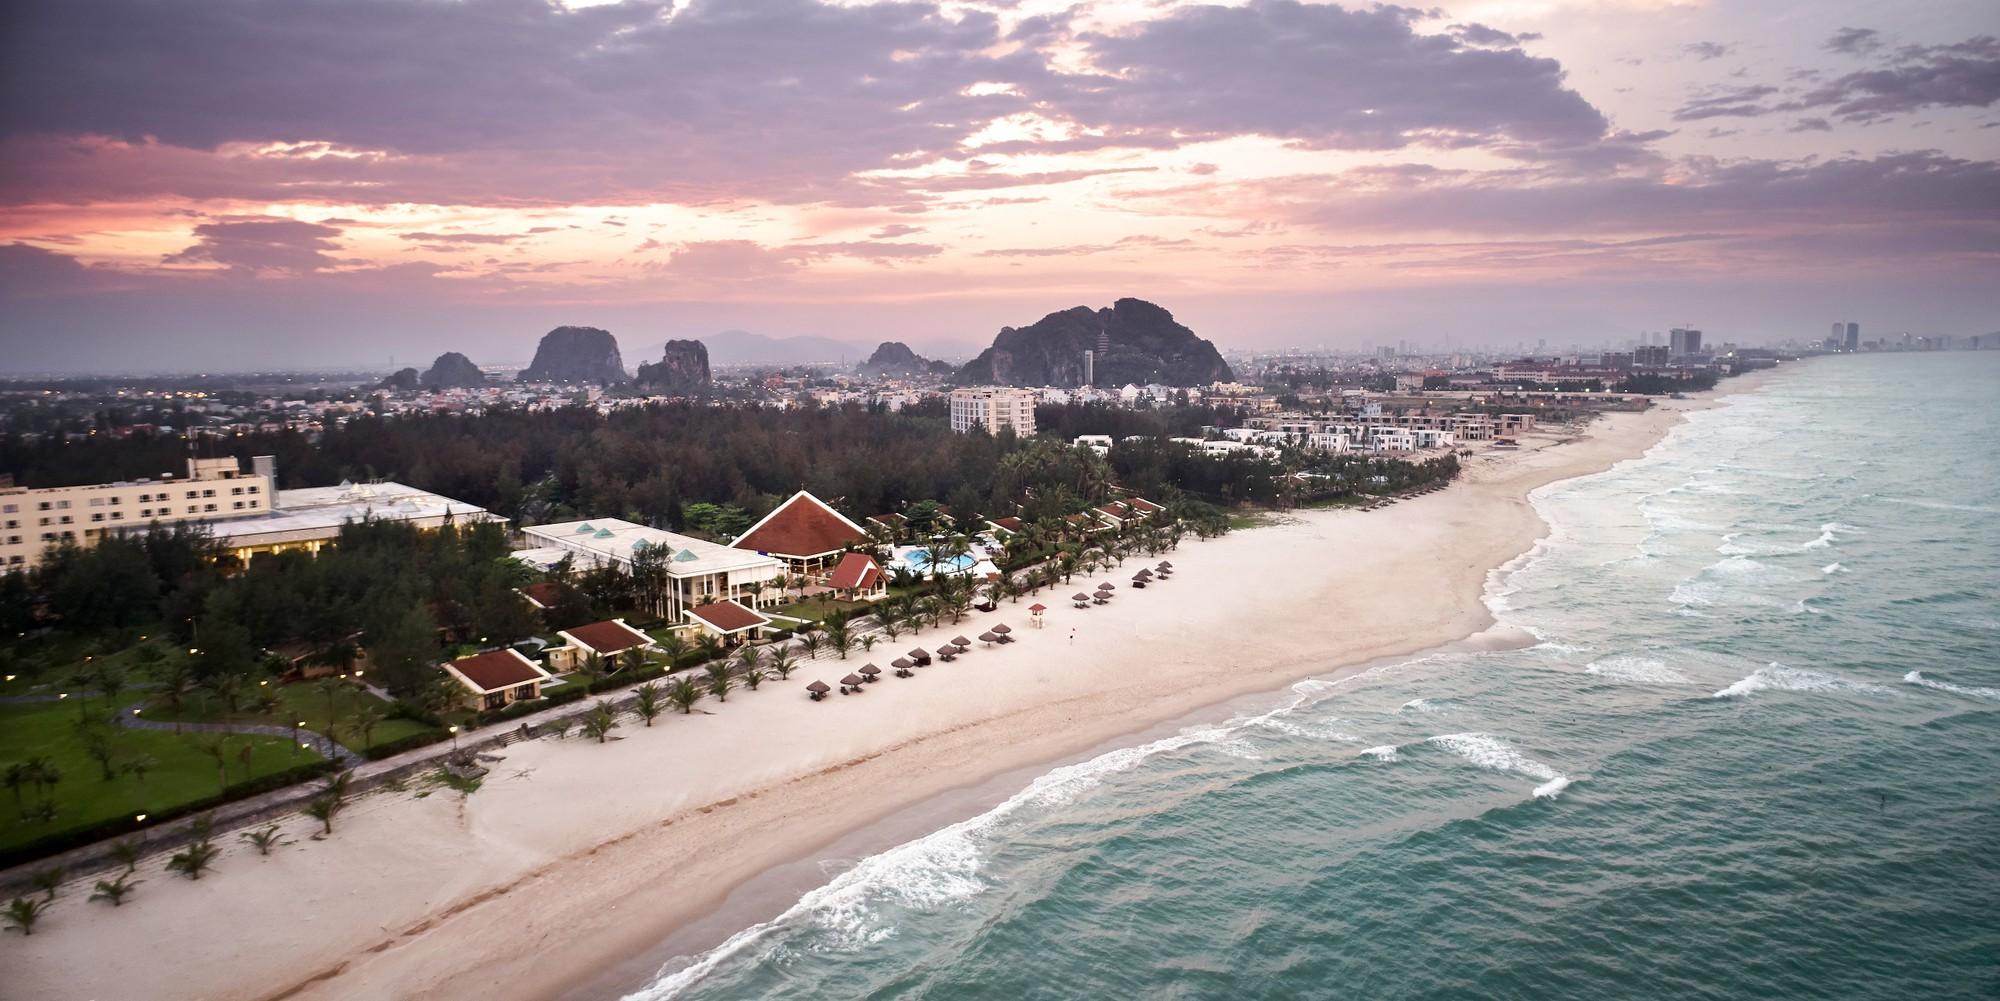 Centara-Sandy-Beach-Resort-Danang